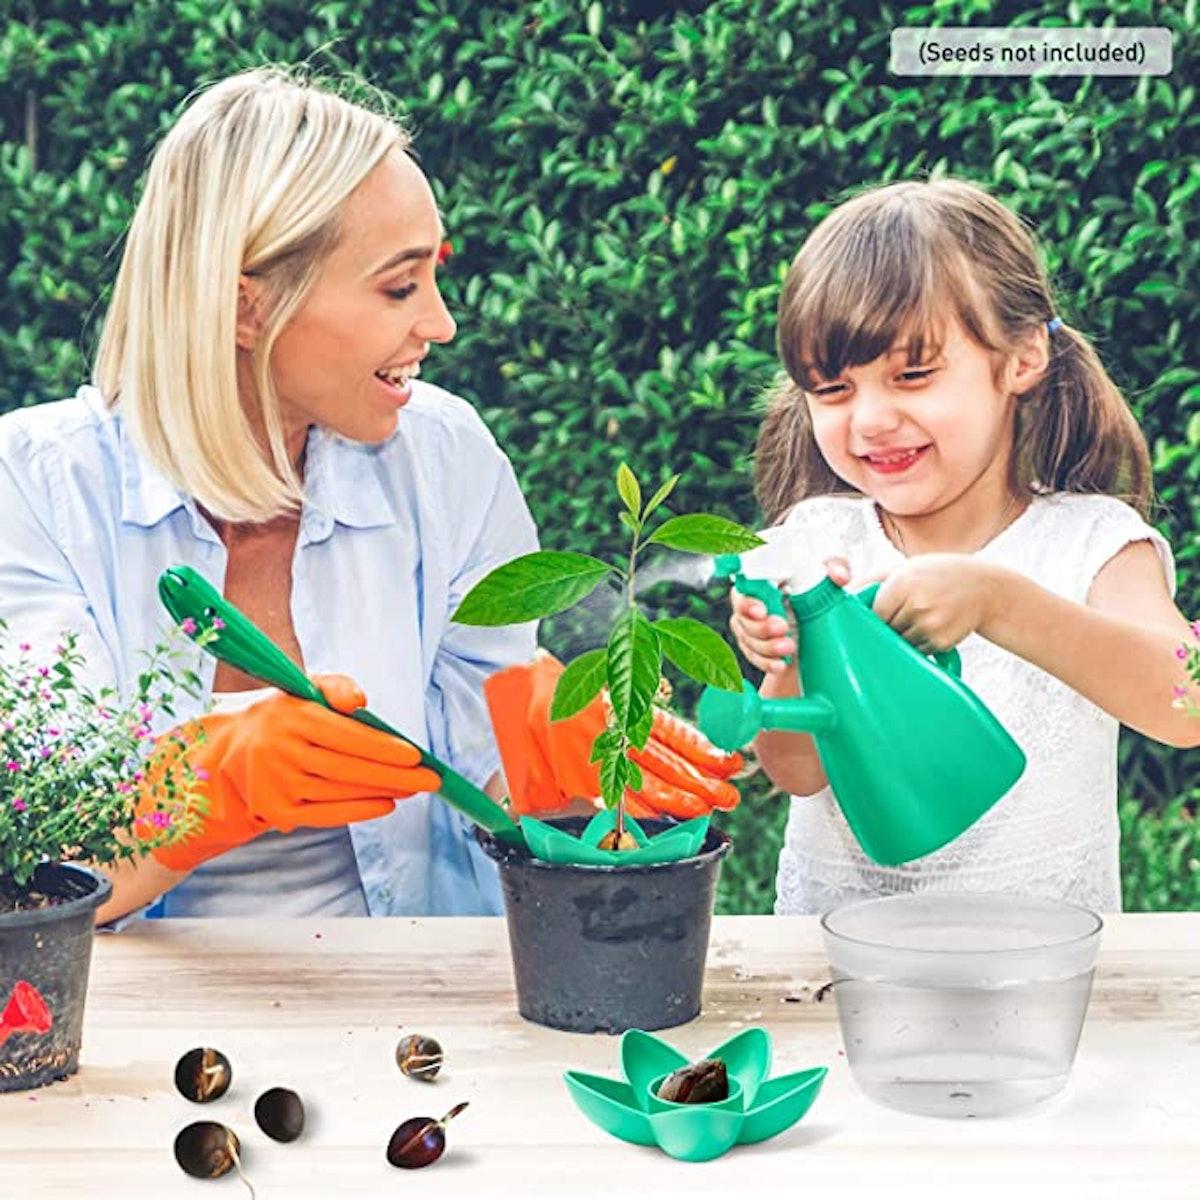 HENMI Avocado Growing Kit